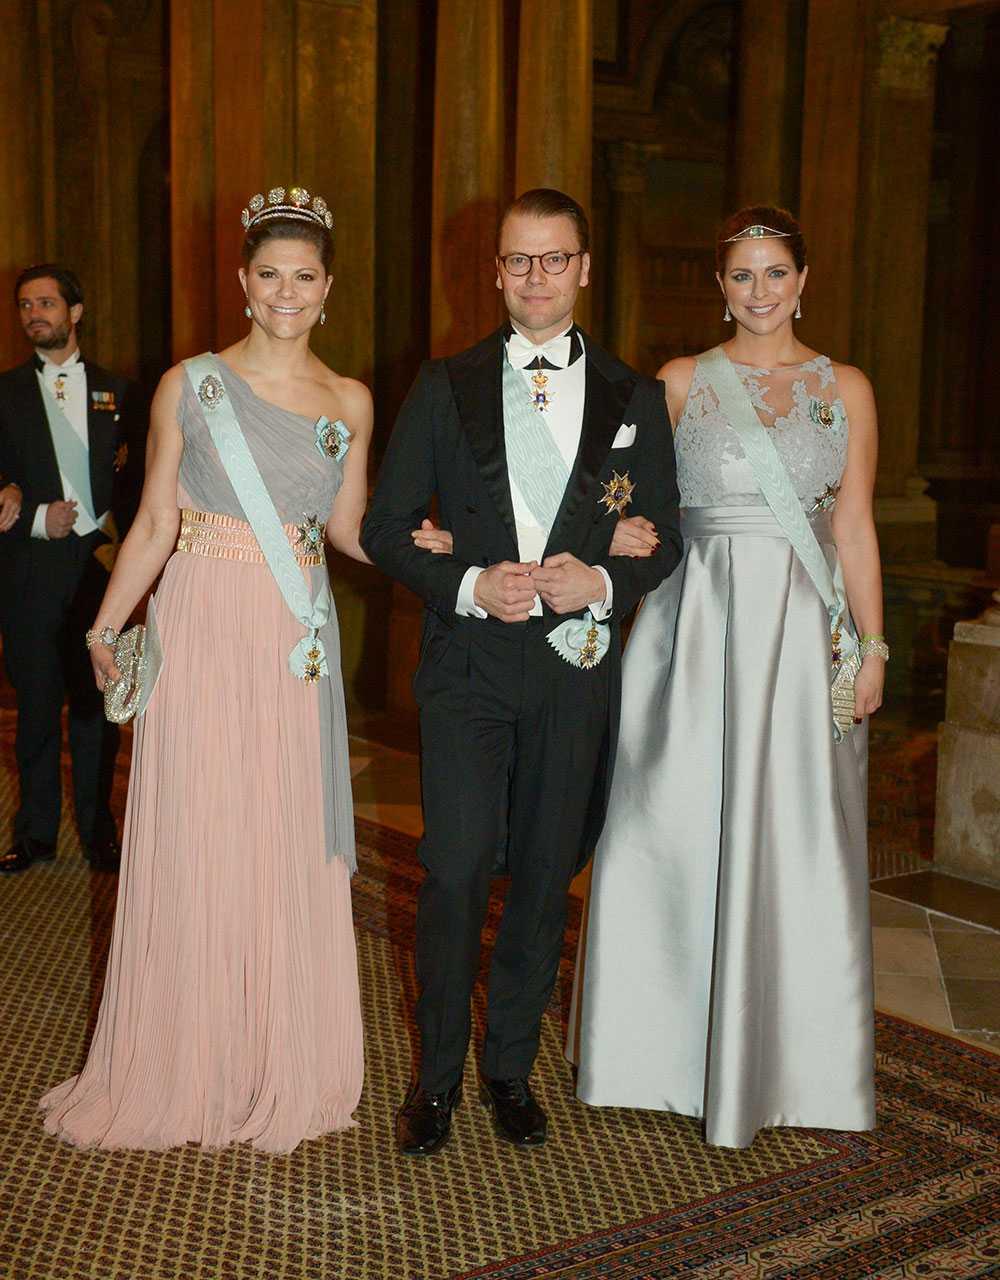 Prinsessan Victoria, prins Daniel och prinsessan Madeleine.